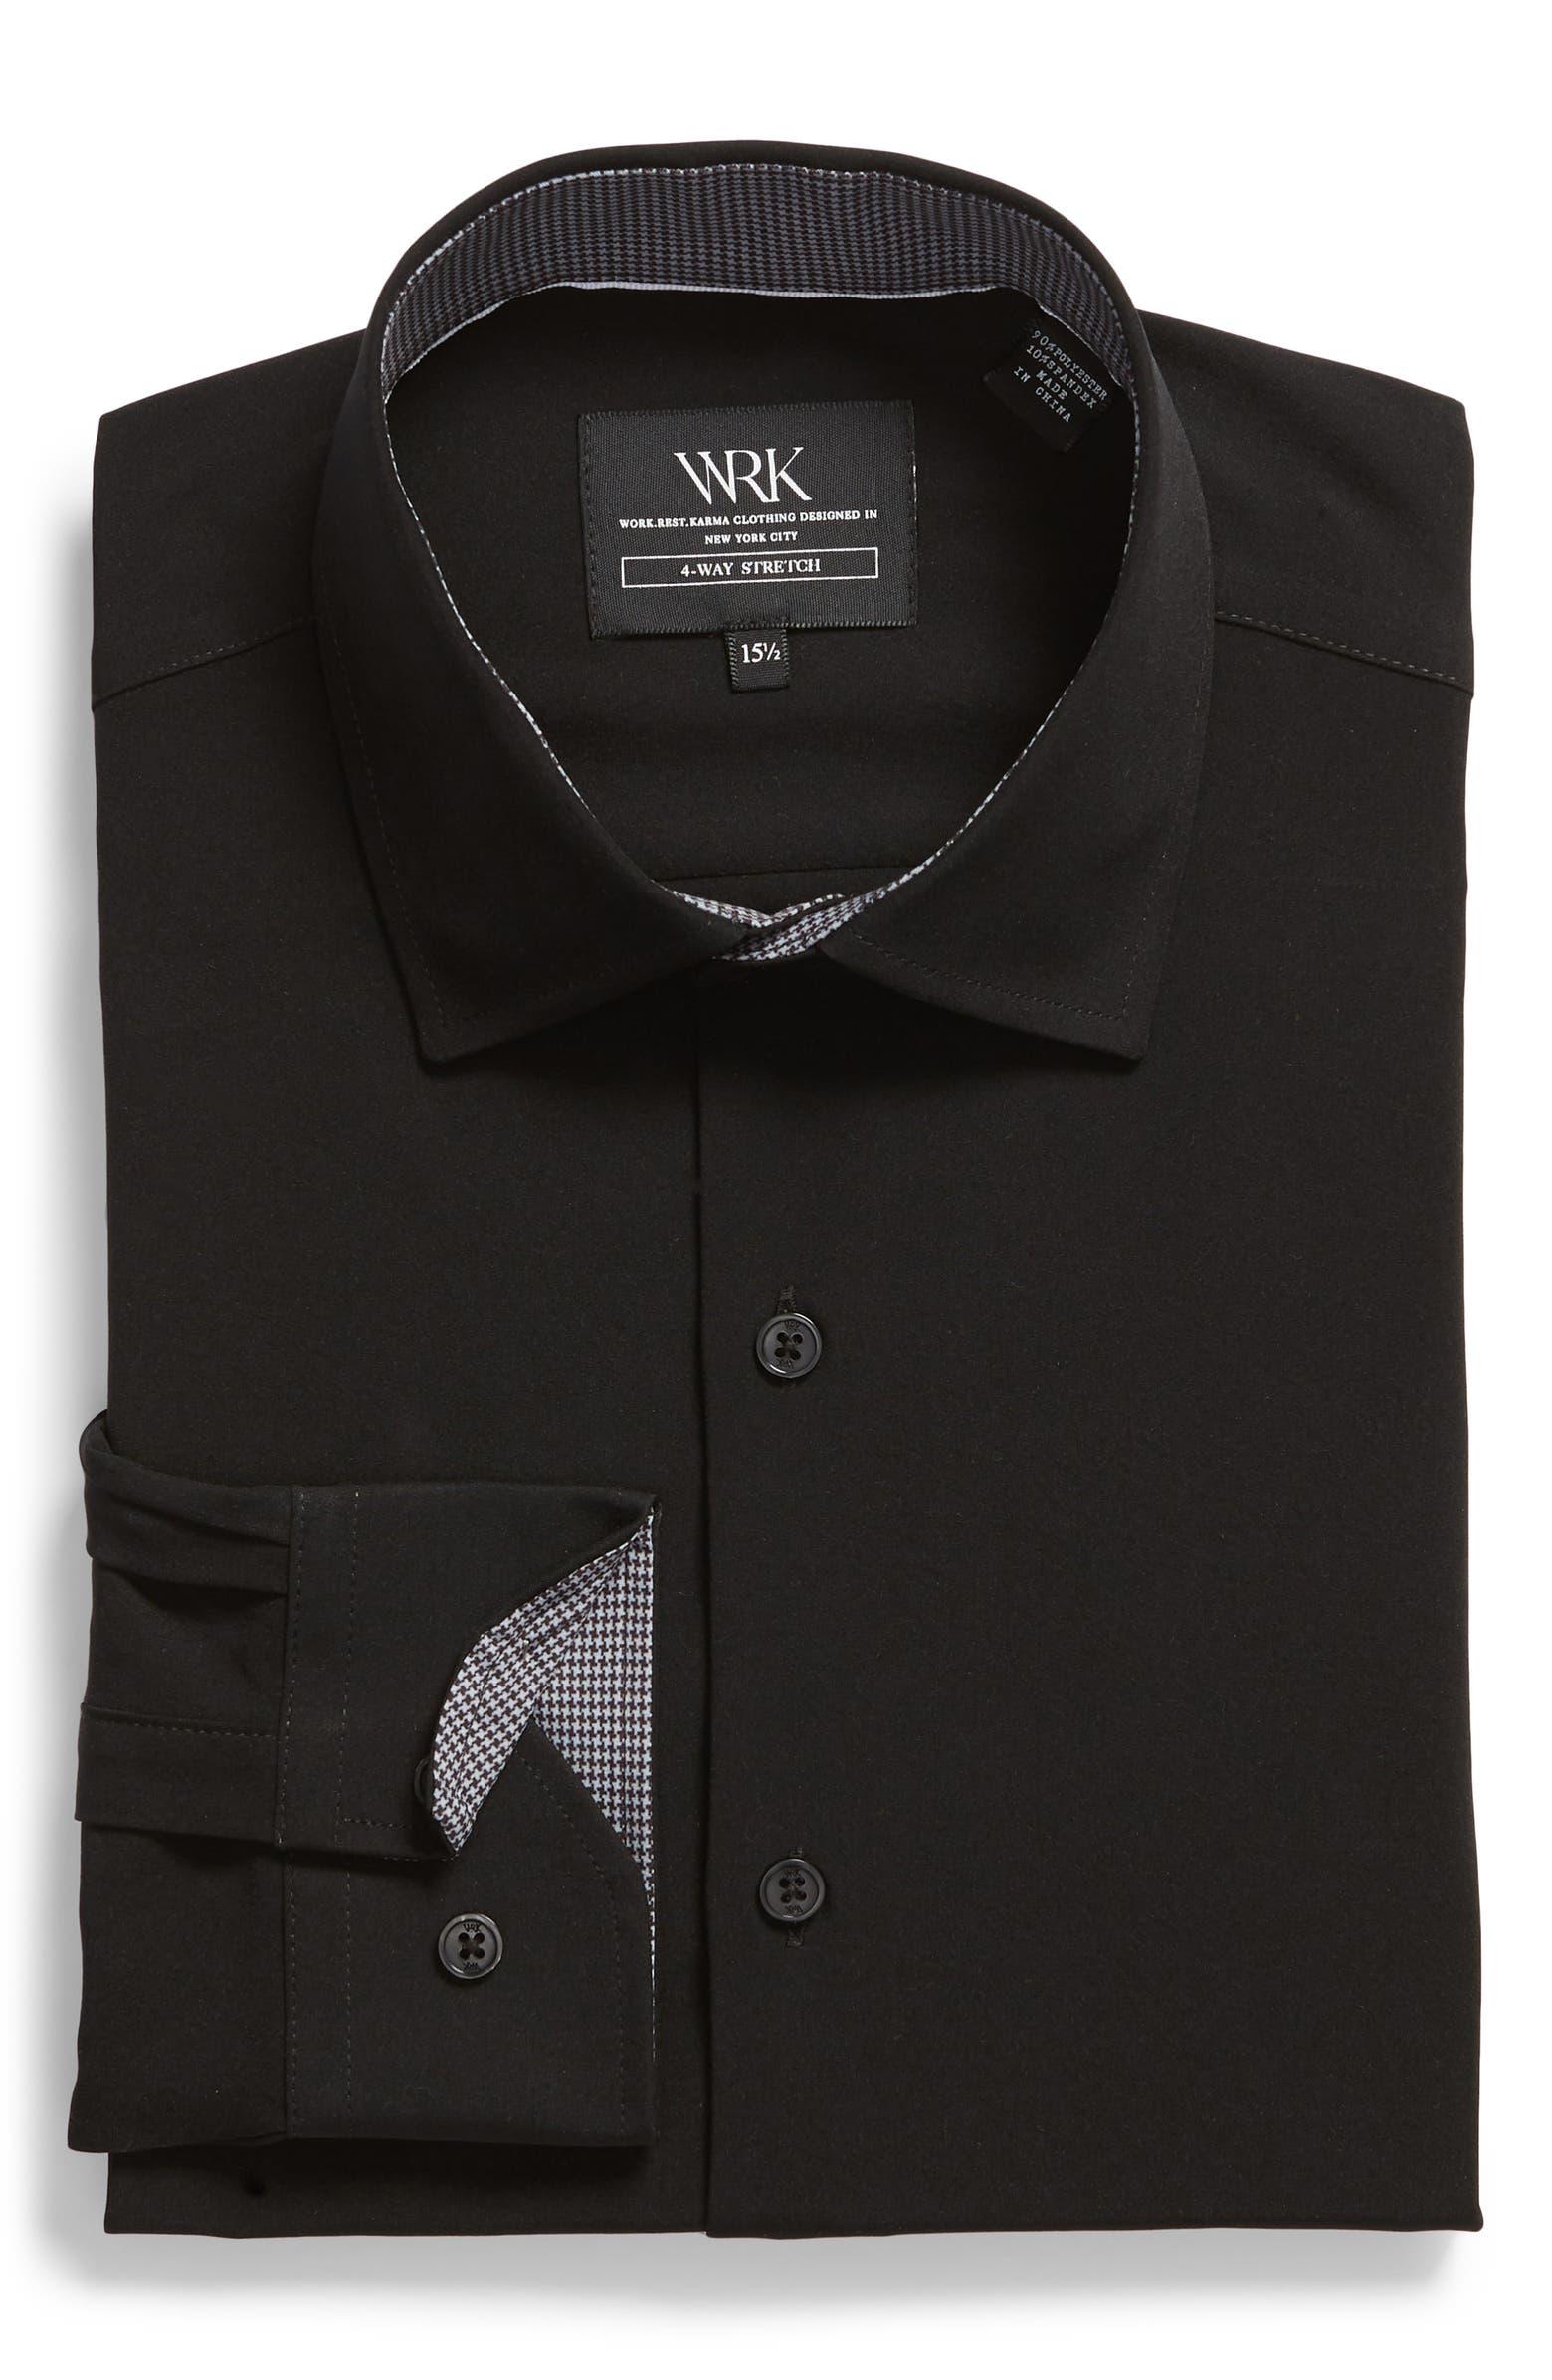 Trim Fit Solid Performance Stretch Dress Shirt W.R.K